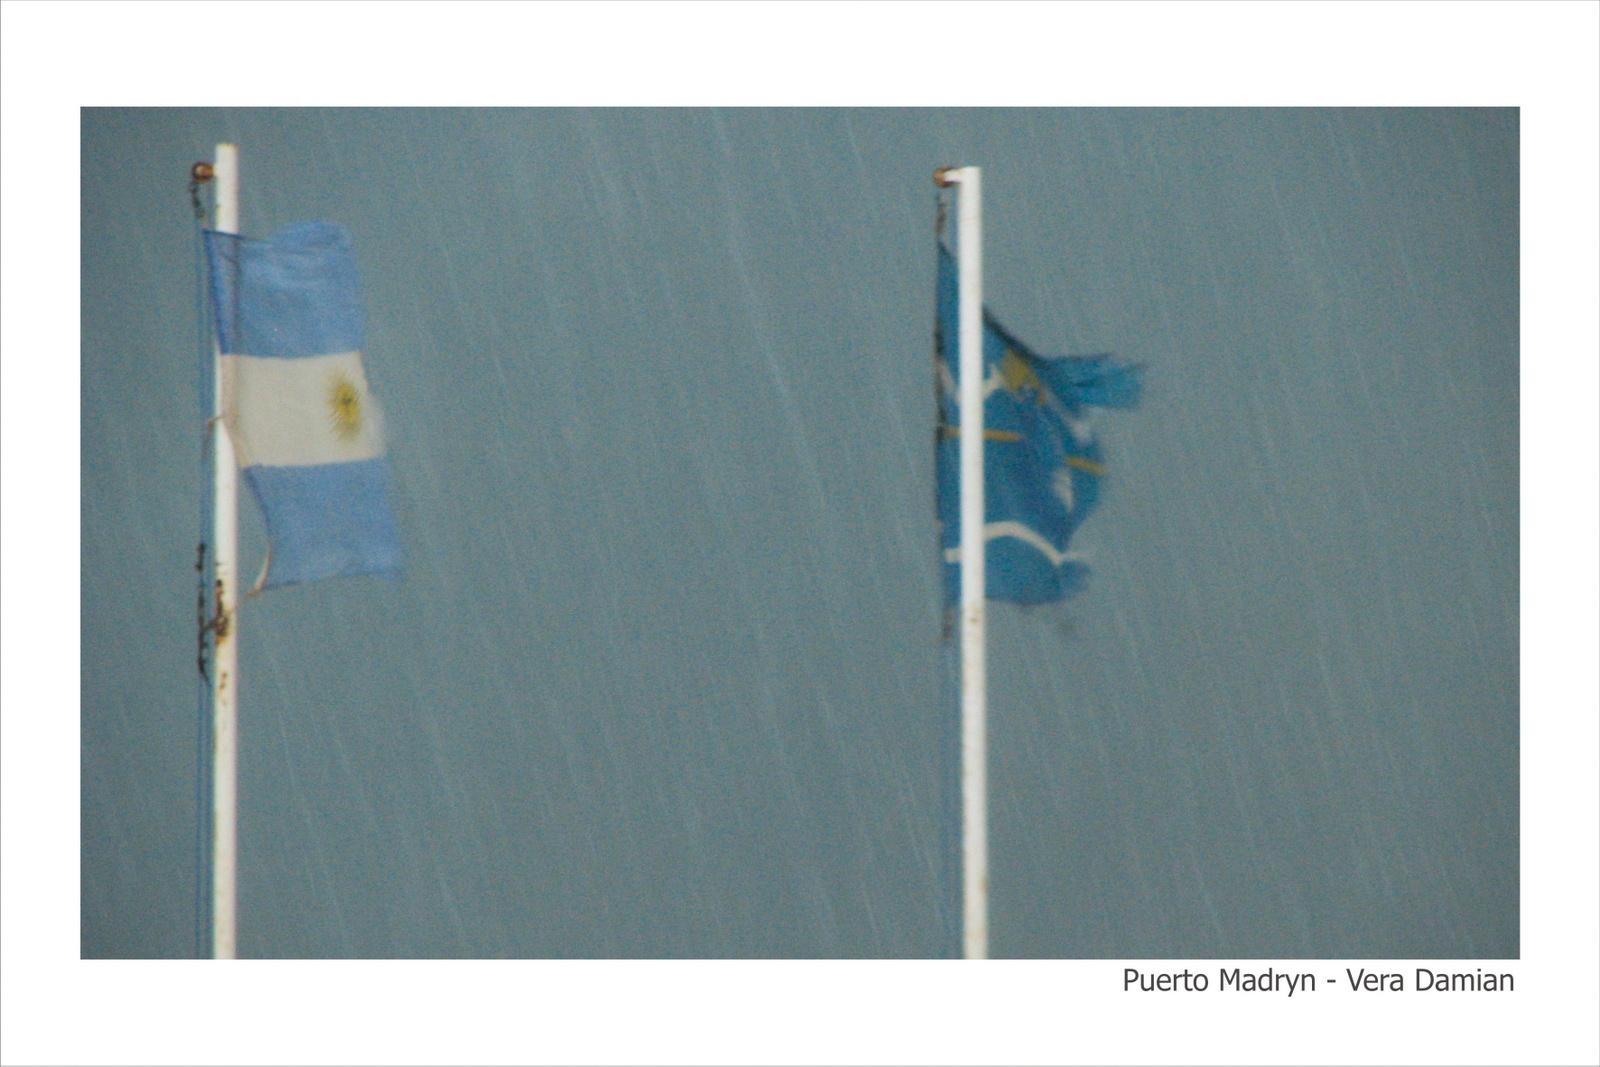 Puerto Madryn - Vera Damian - 20-30